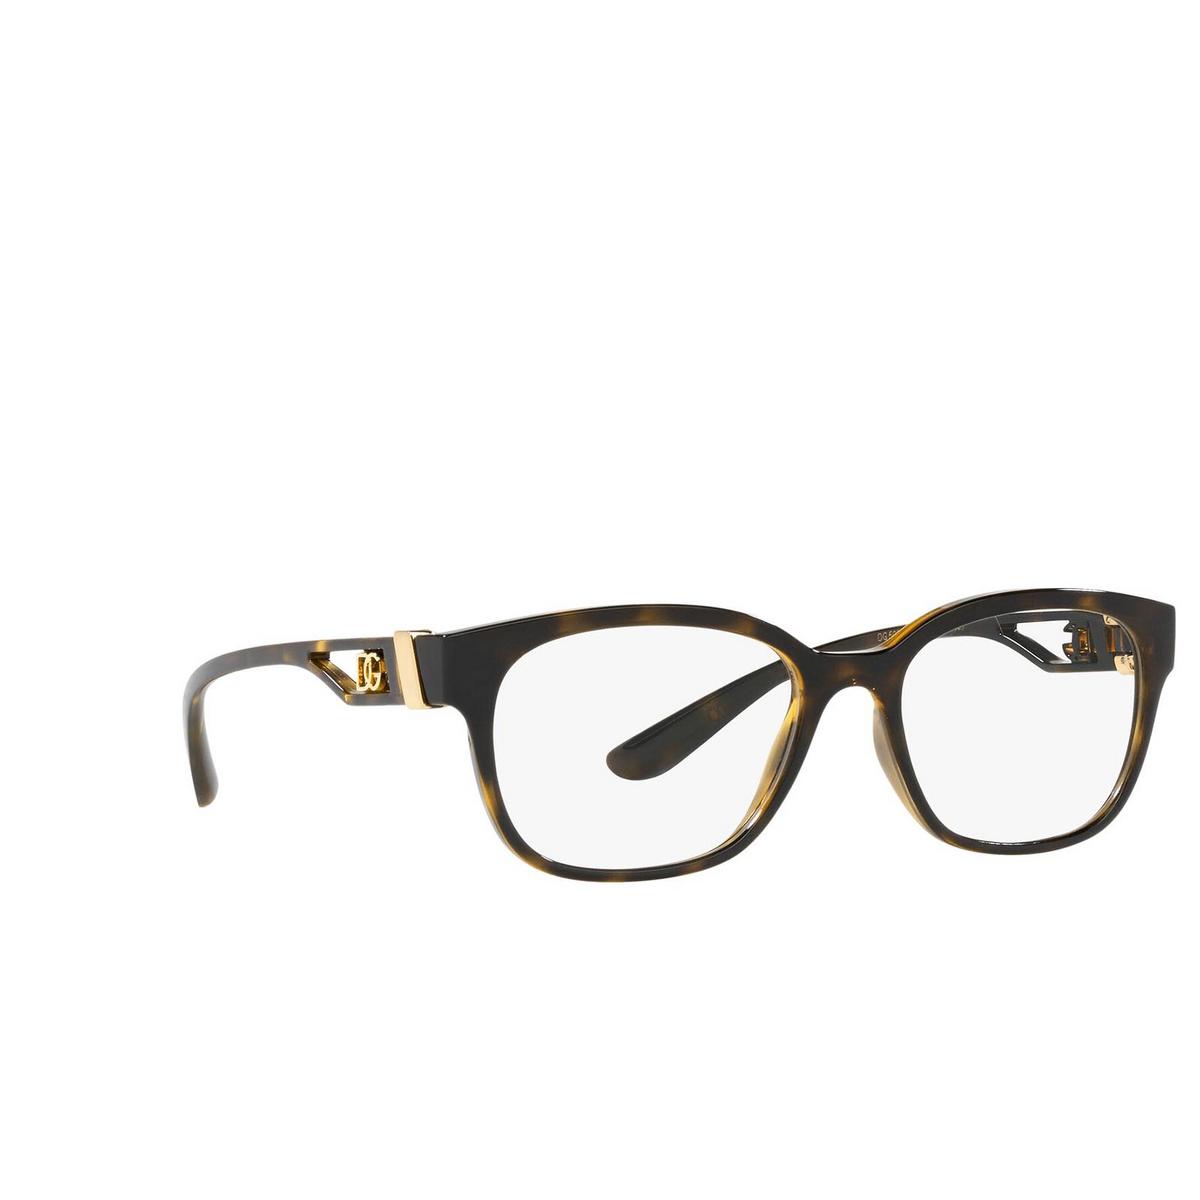 Dolce & Gabbana® Rectangle Eyeglasses: DG5066 color Havana 502 - three-quarters view.